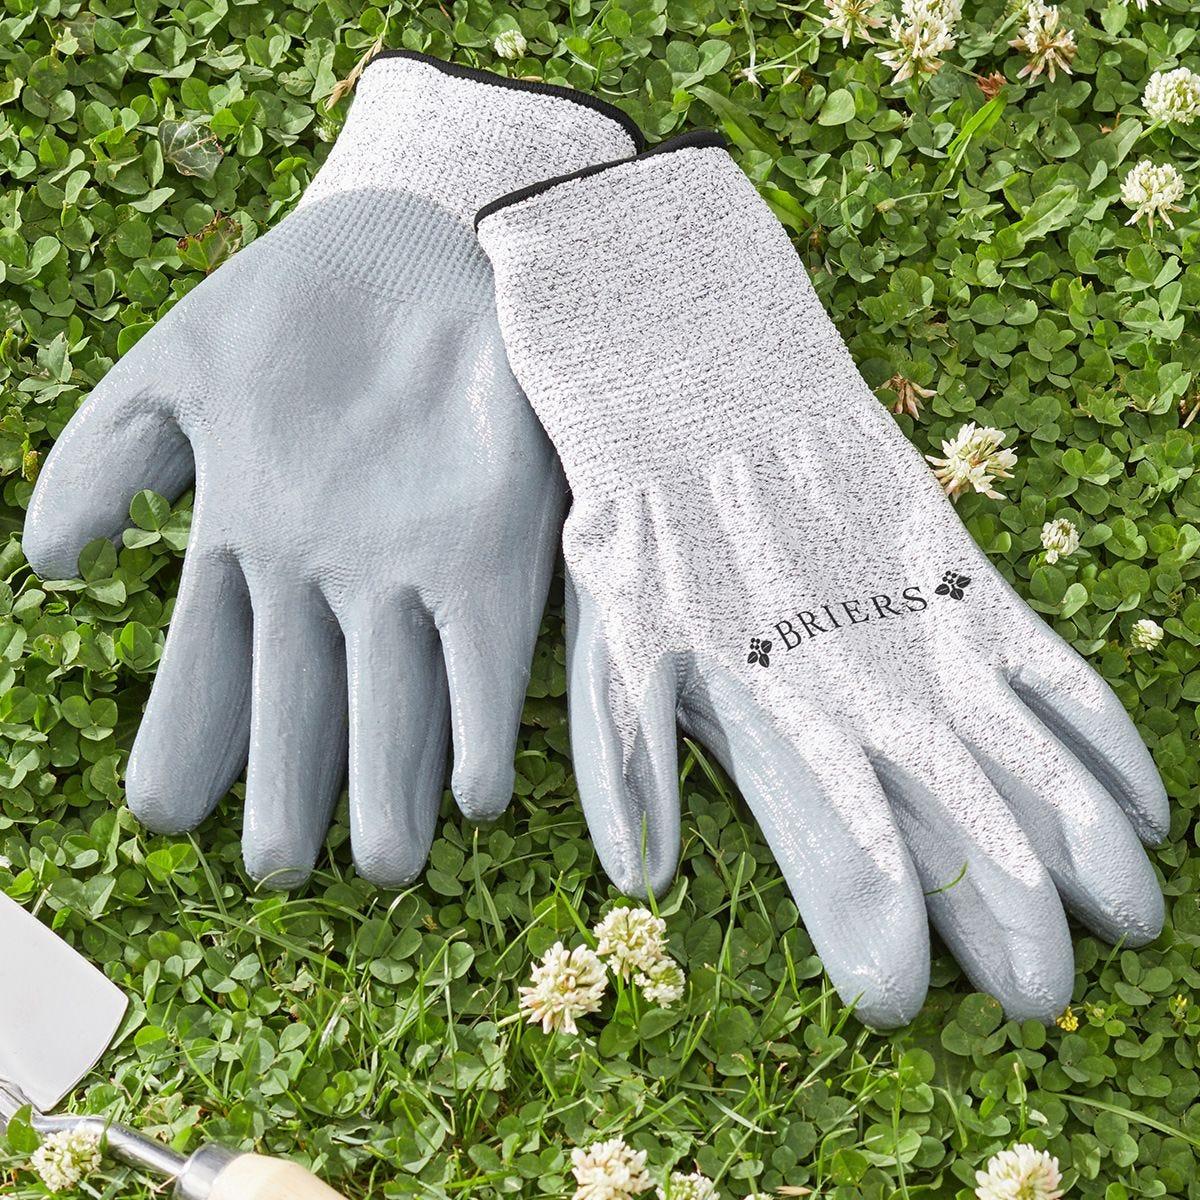 Briers Advanced Cut Resistant Garden Gloves - Large